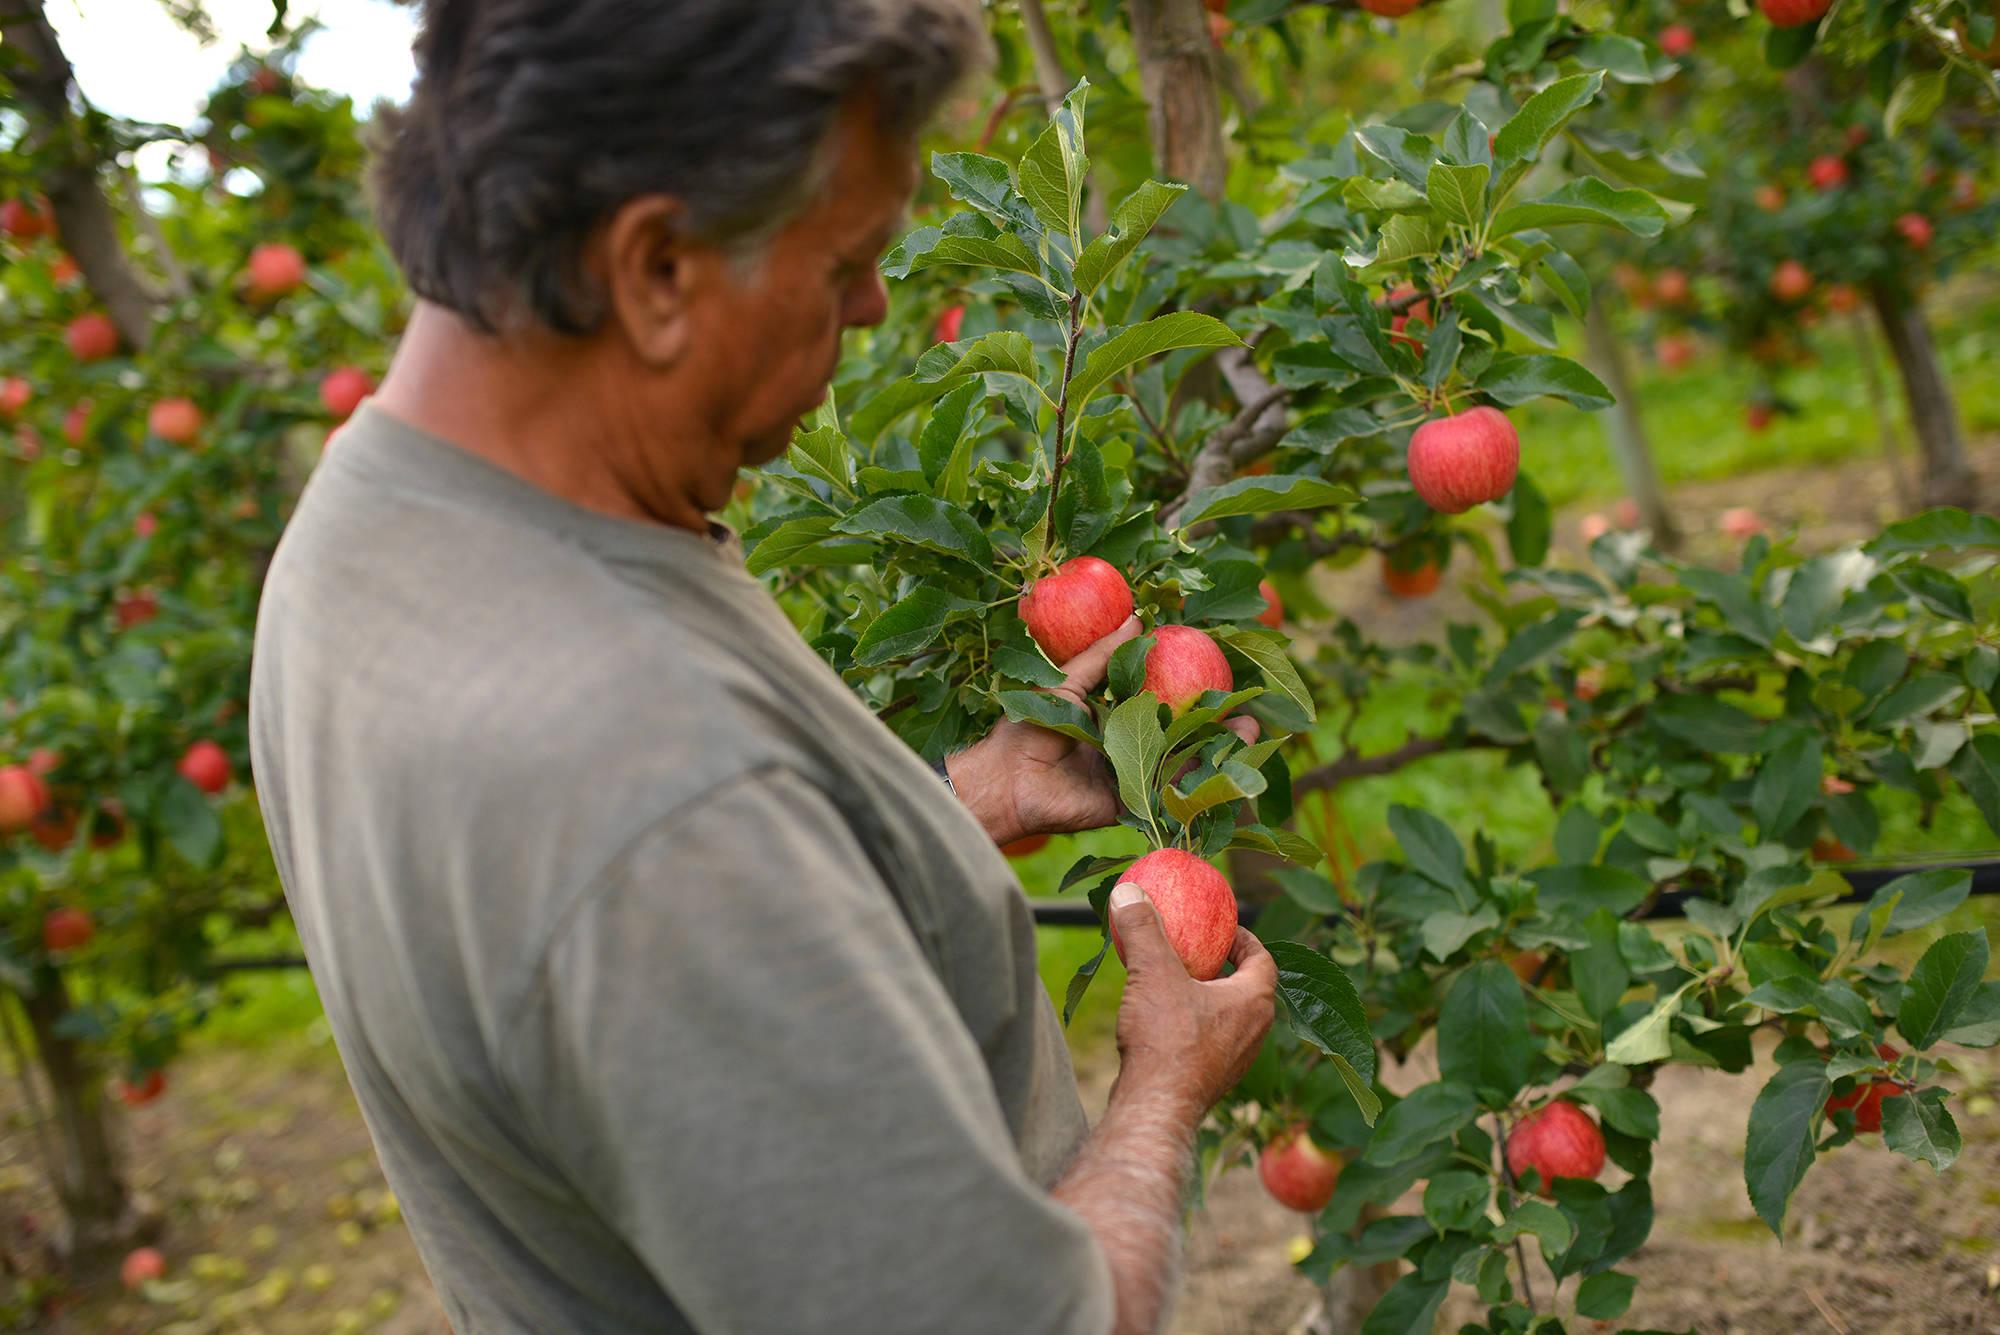 Sam DiMaria, owner of Bella Rosa Orchard, examines his harvest in September. (Phil McLachlan - Kelowna Capital News - File)